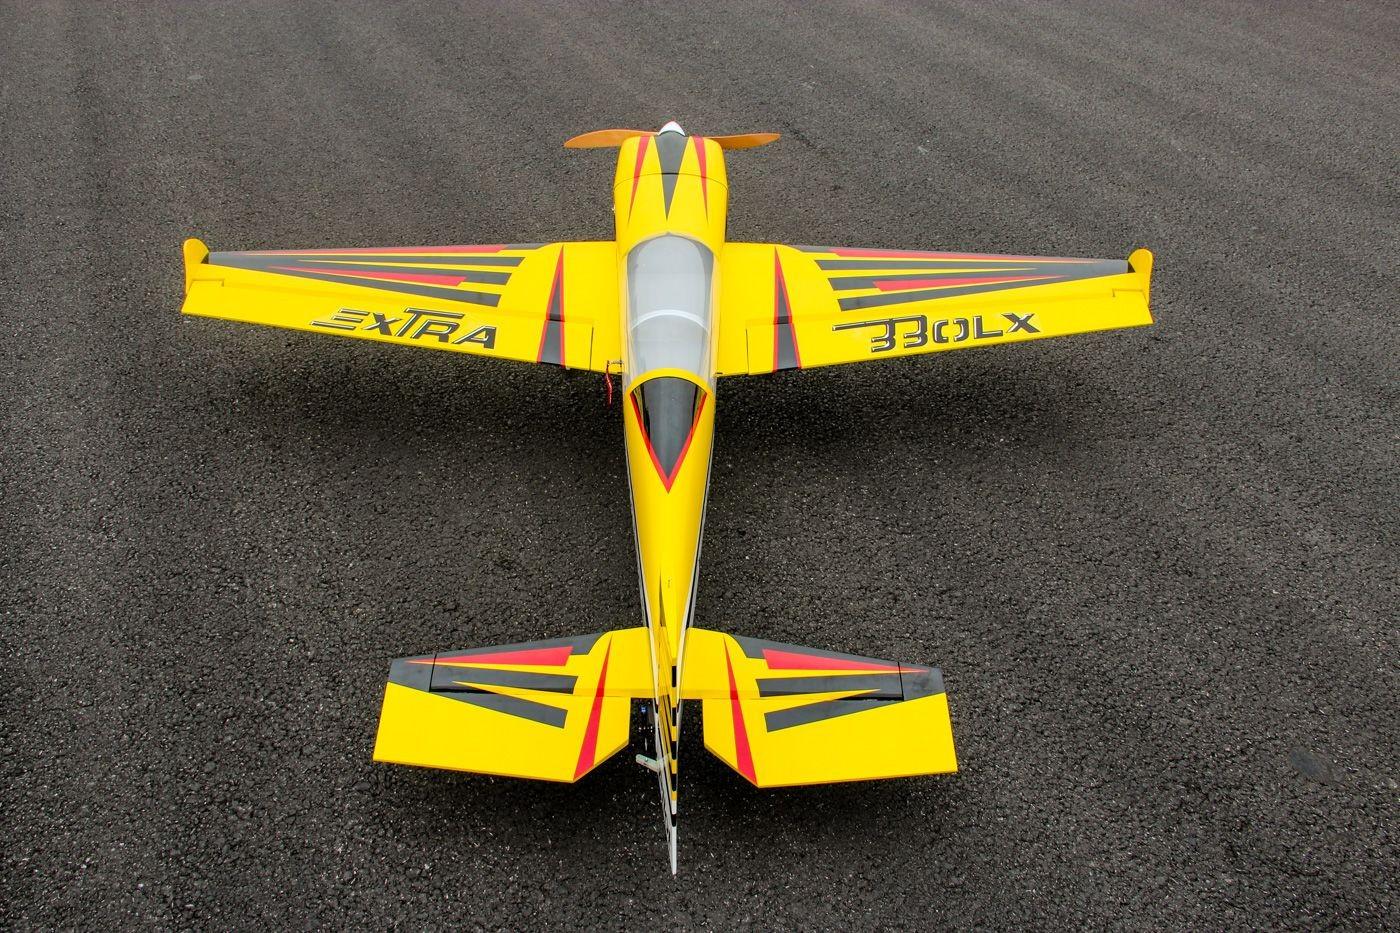 Extra 330 LX Pilot RC